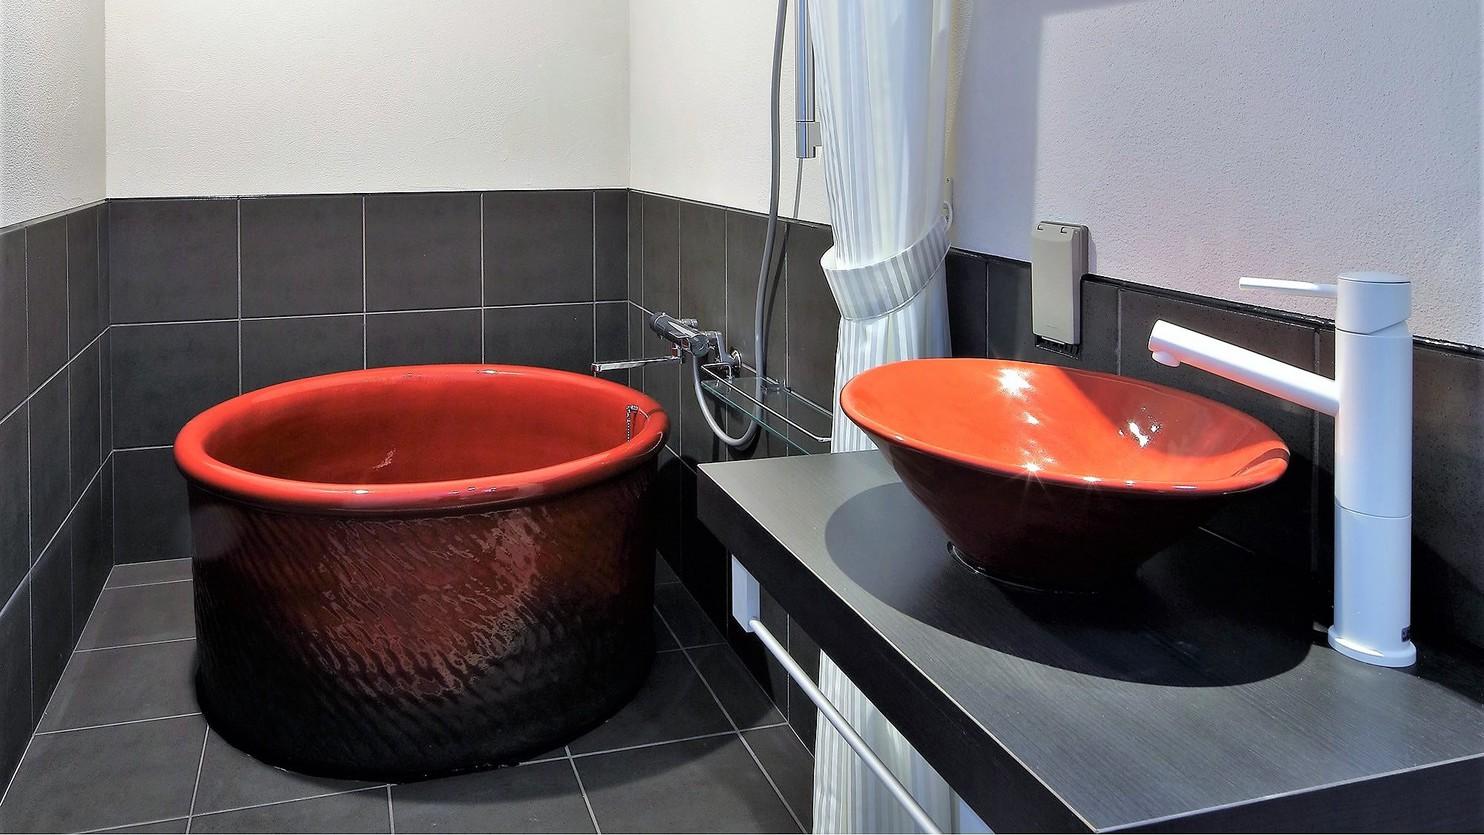 Bathroom402号室 紅楓(Momiji) Superior Double Room